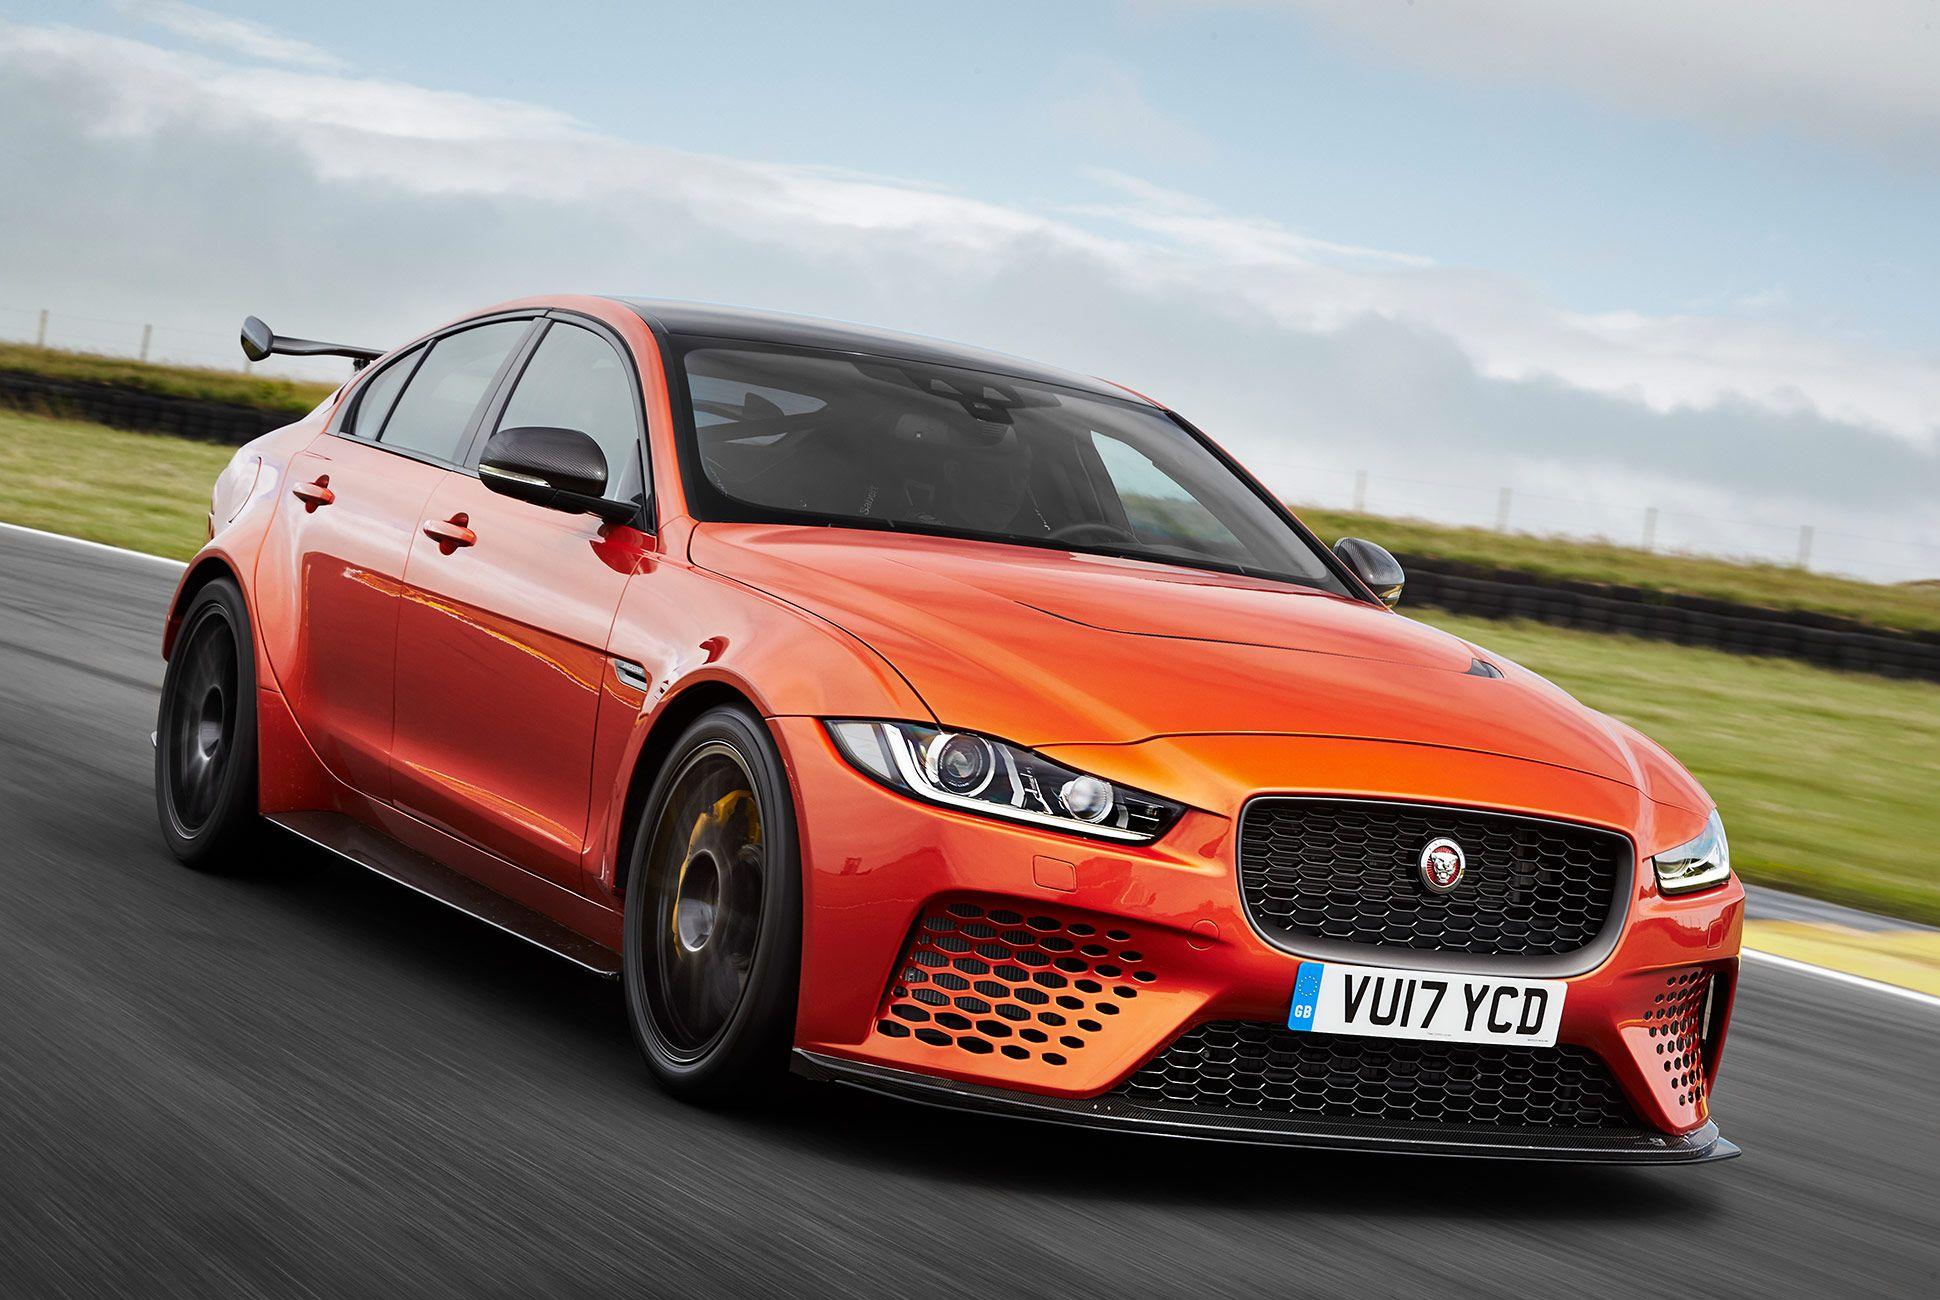 Jaguar S New 600 Horsepower Sport Sedan Obliterates Physics Jaguar Xe Jaguar Car Jaguar